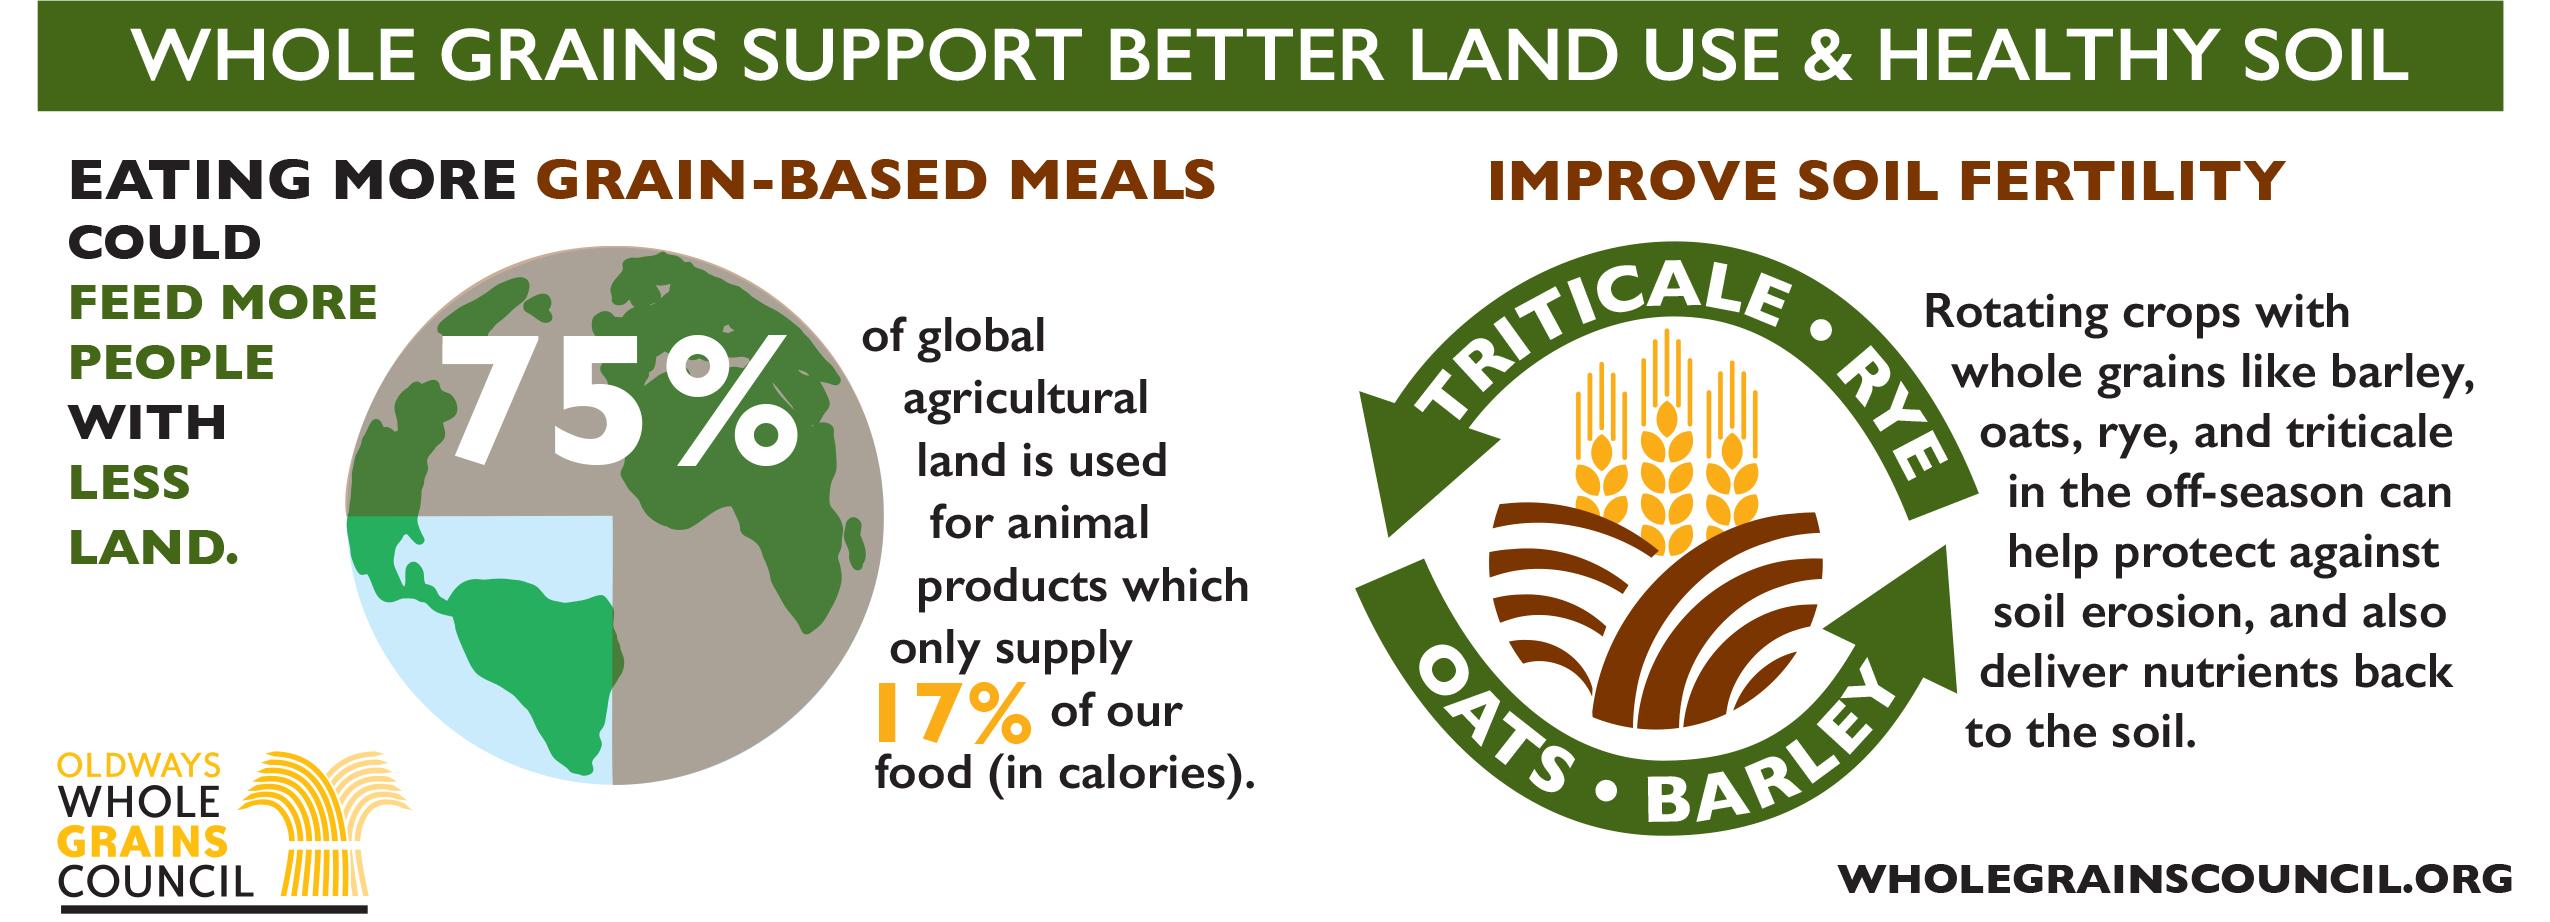 WG_SustainableFood_infographic-3.jpg